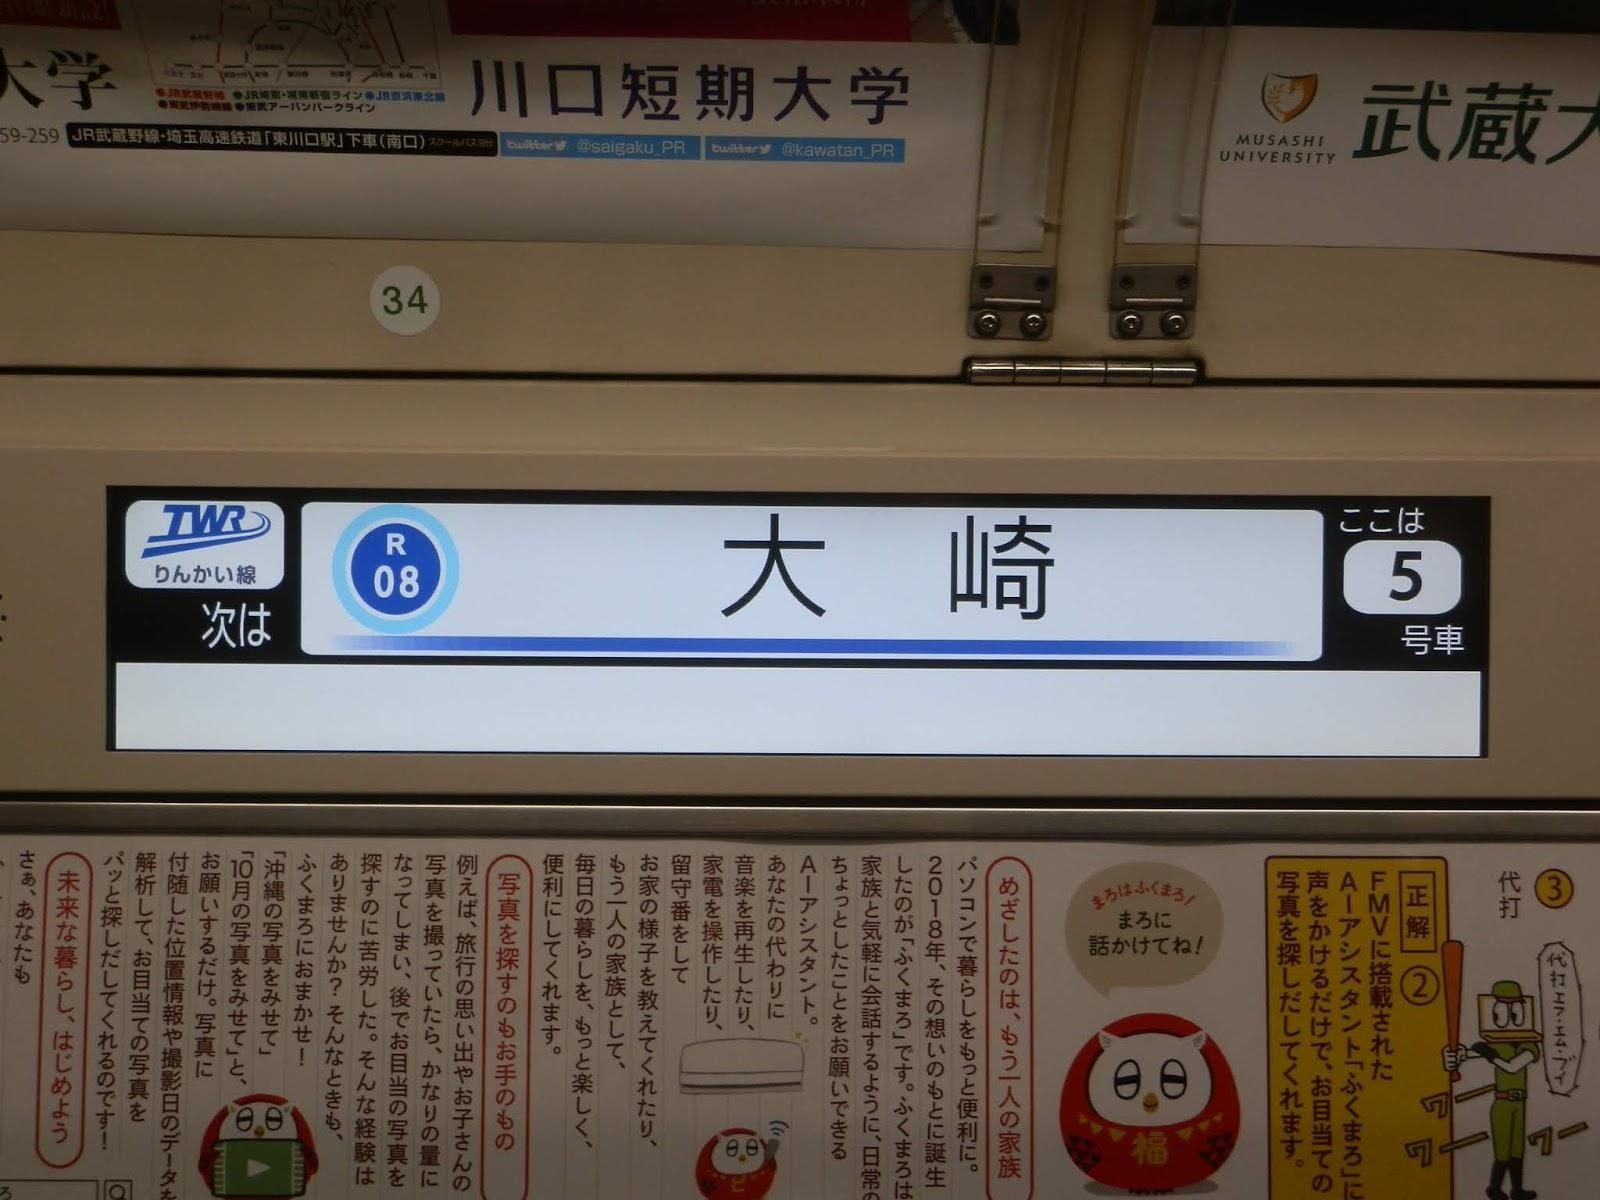 小田急沿線住み鉄道ファン日記: 【70-000形で初】東京臨海高速鉄道70 ...